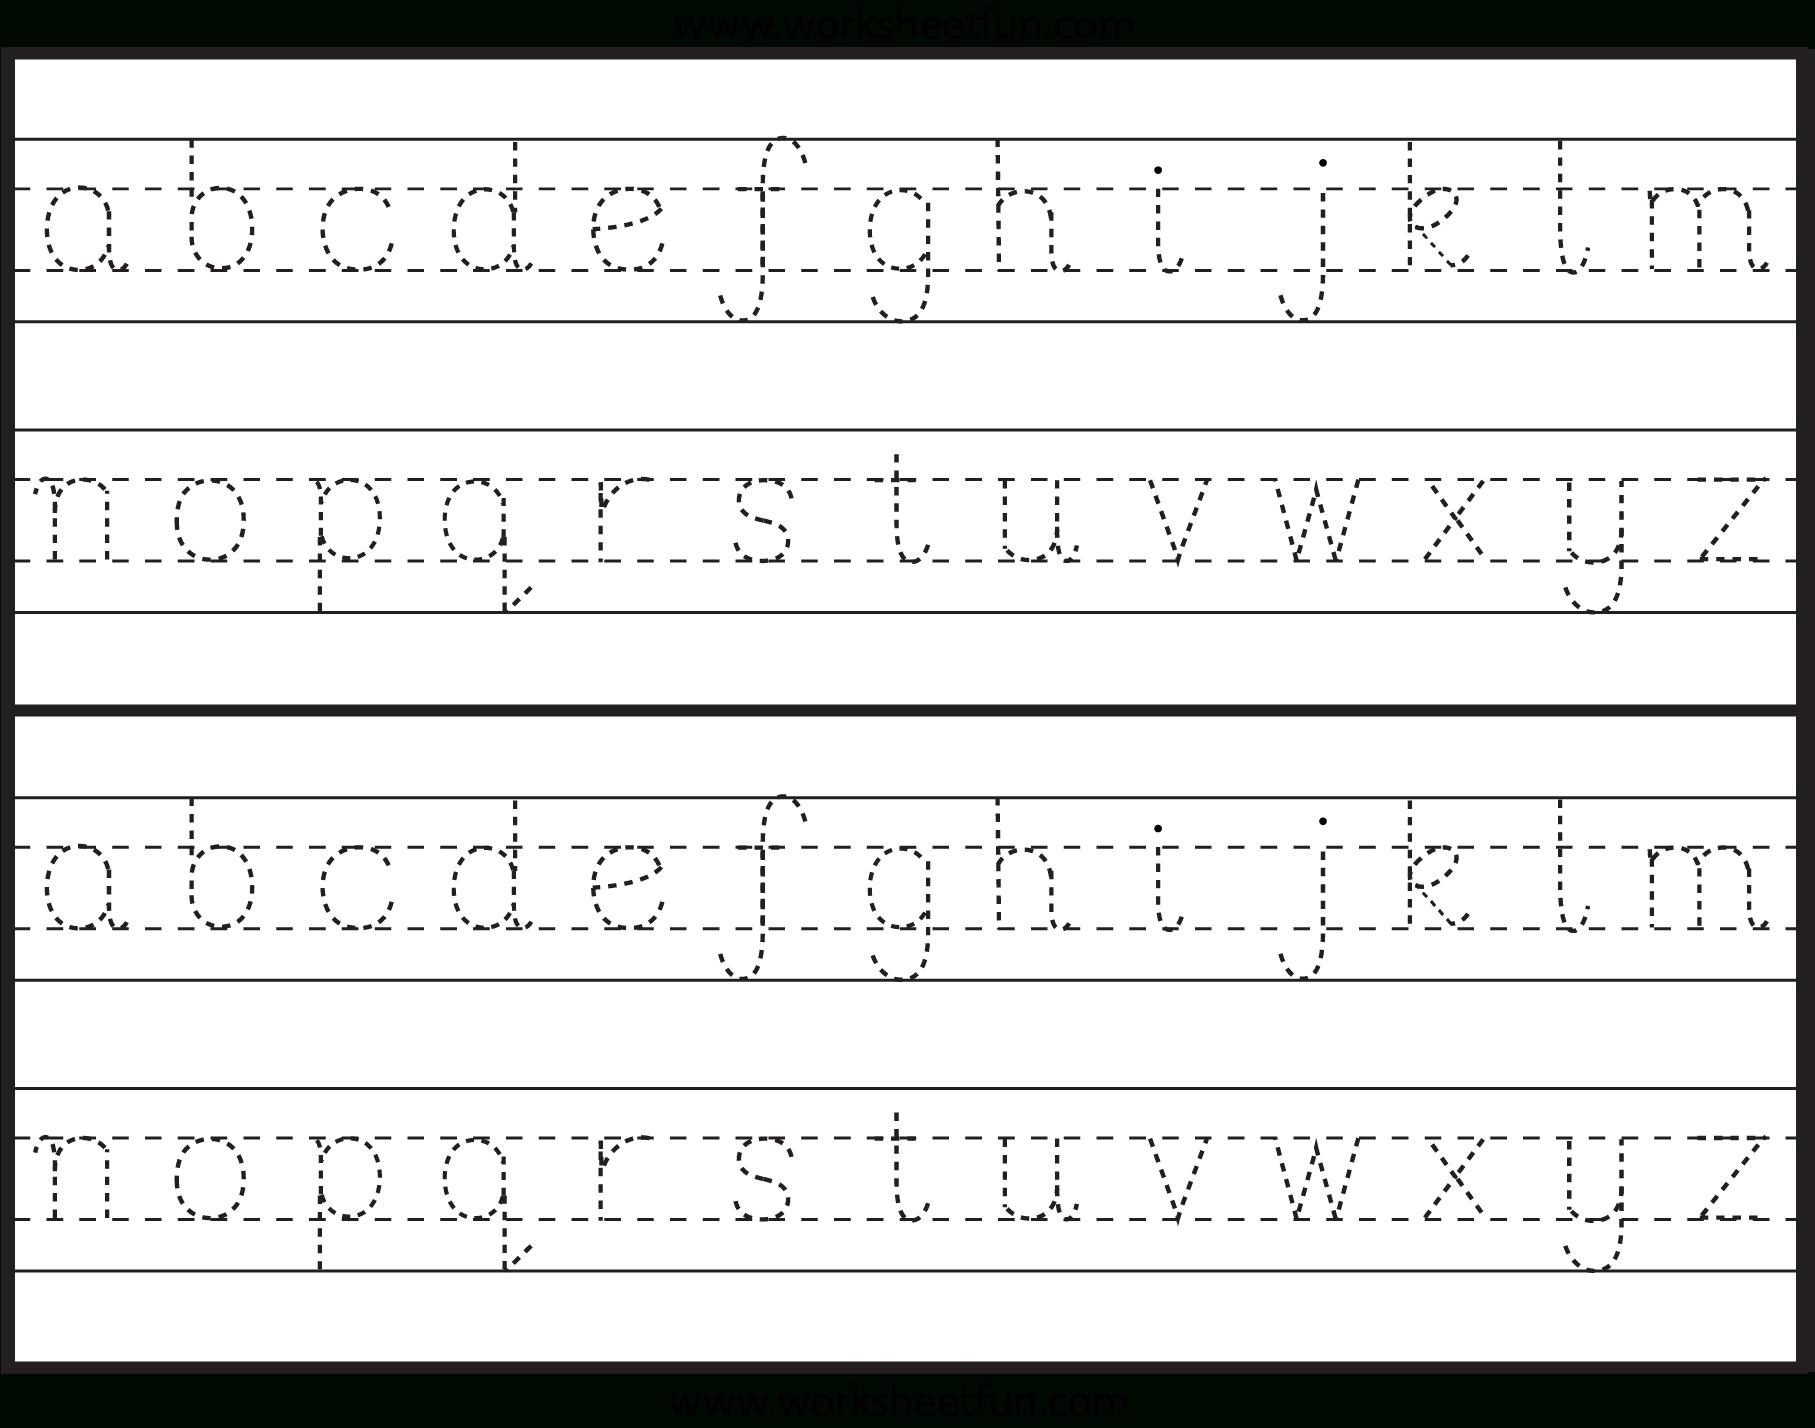 Reading Worksheets Alphabet Tracing Pdf Name Worksheet within Pre-K Worksheets Alphabet Tracing